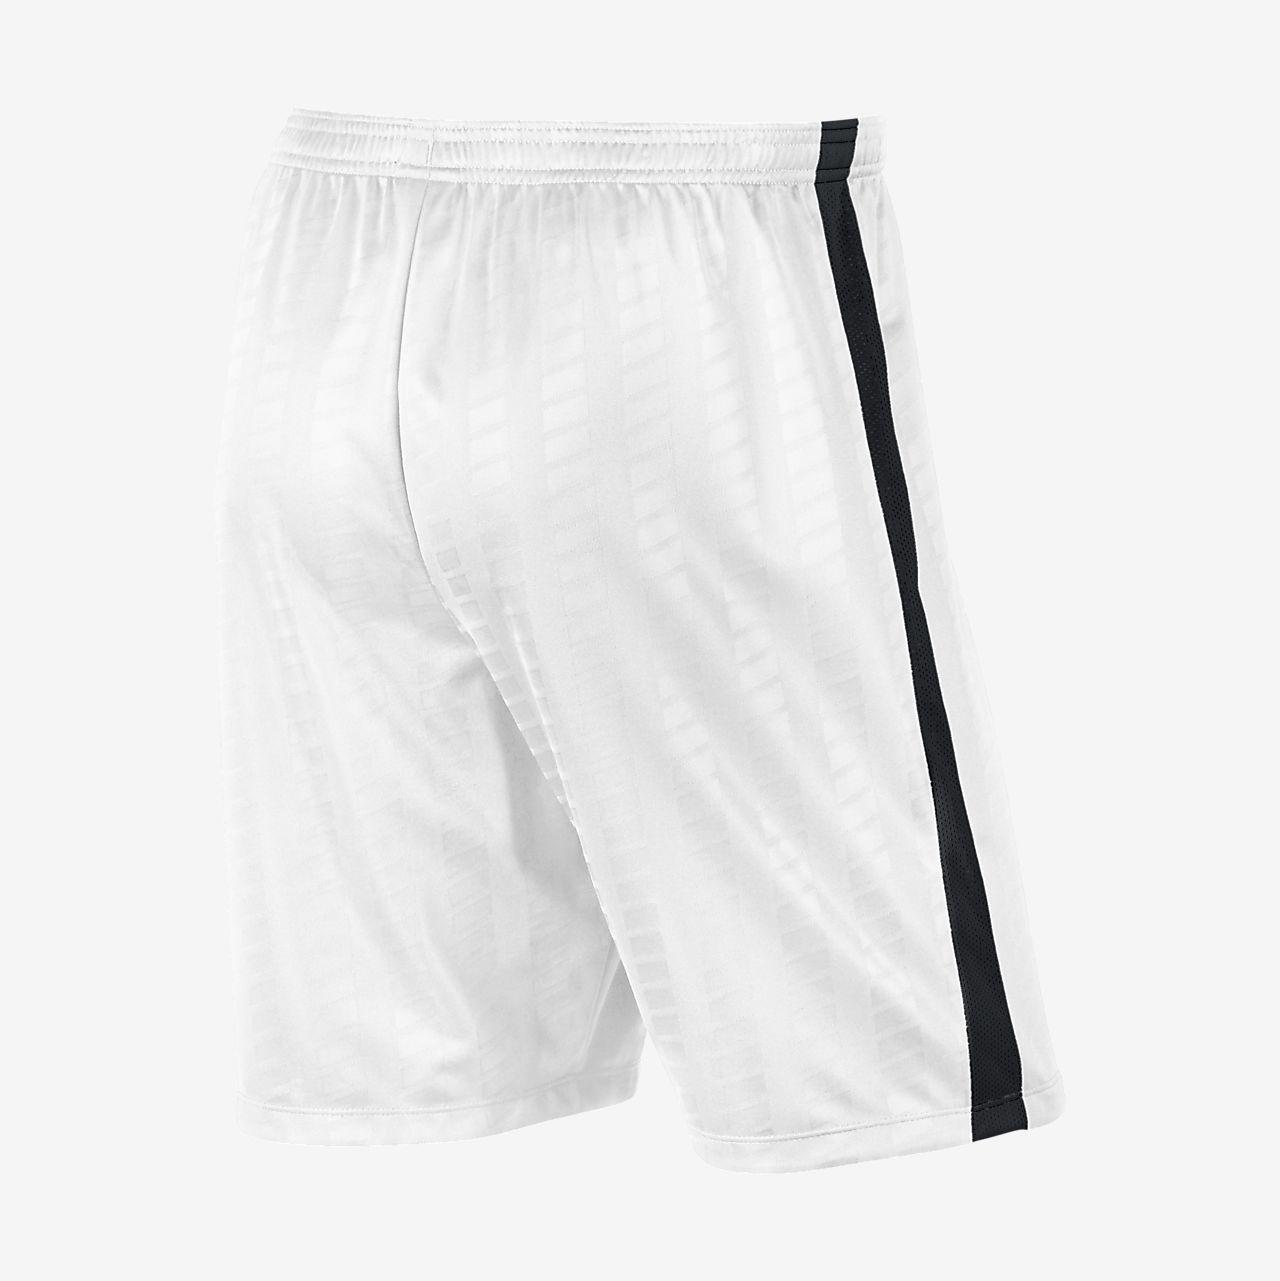 buy popular 4d4d7 c92b1 Low Resolution Nike Academy Men s Football Shorts Nike Academy Men s Football  Shorts